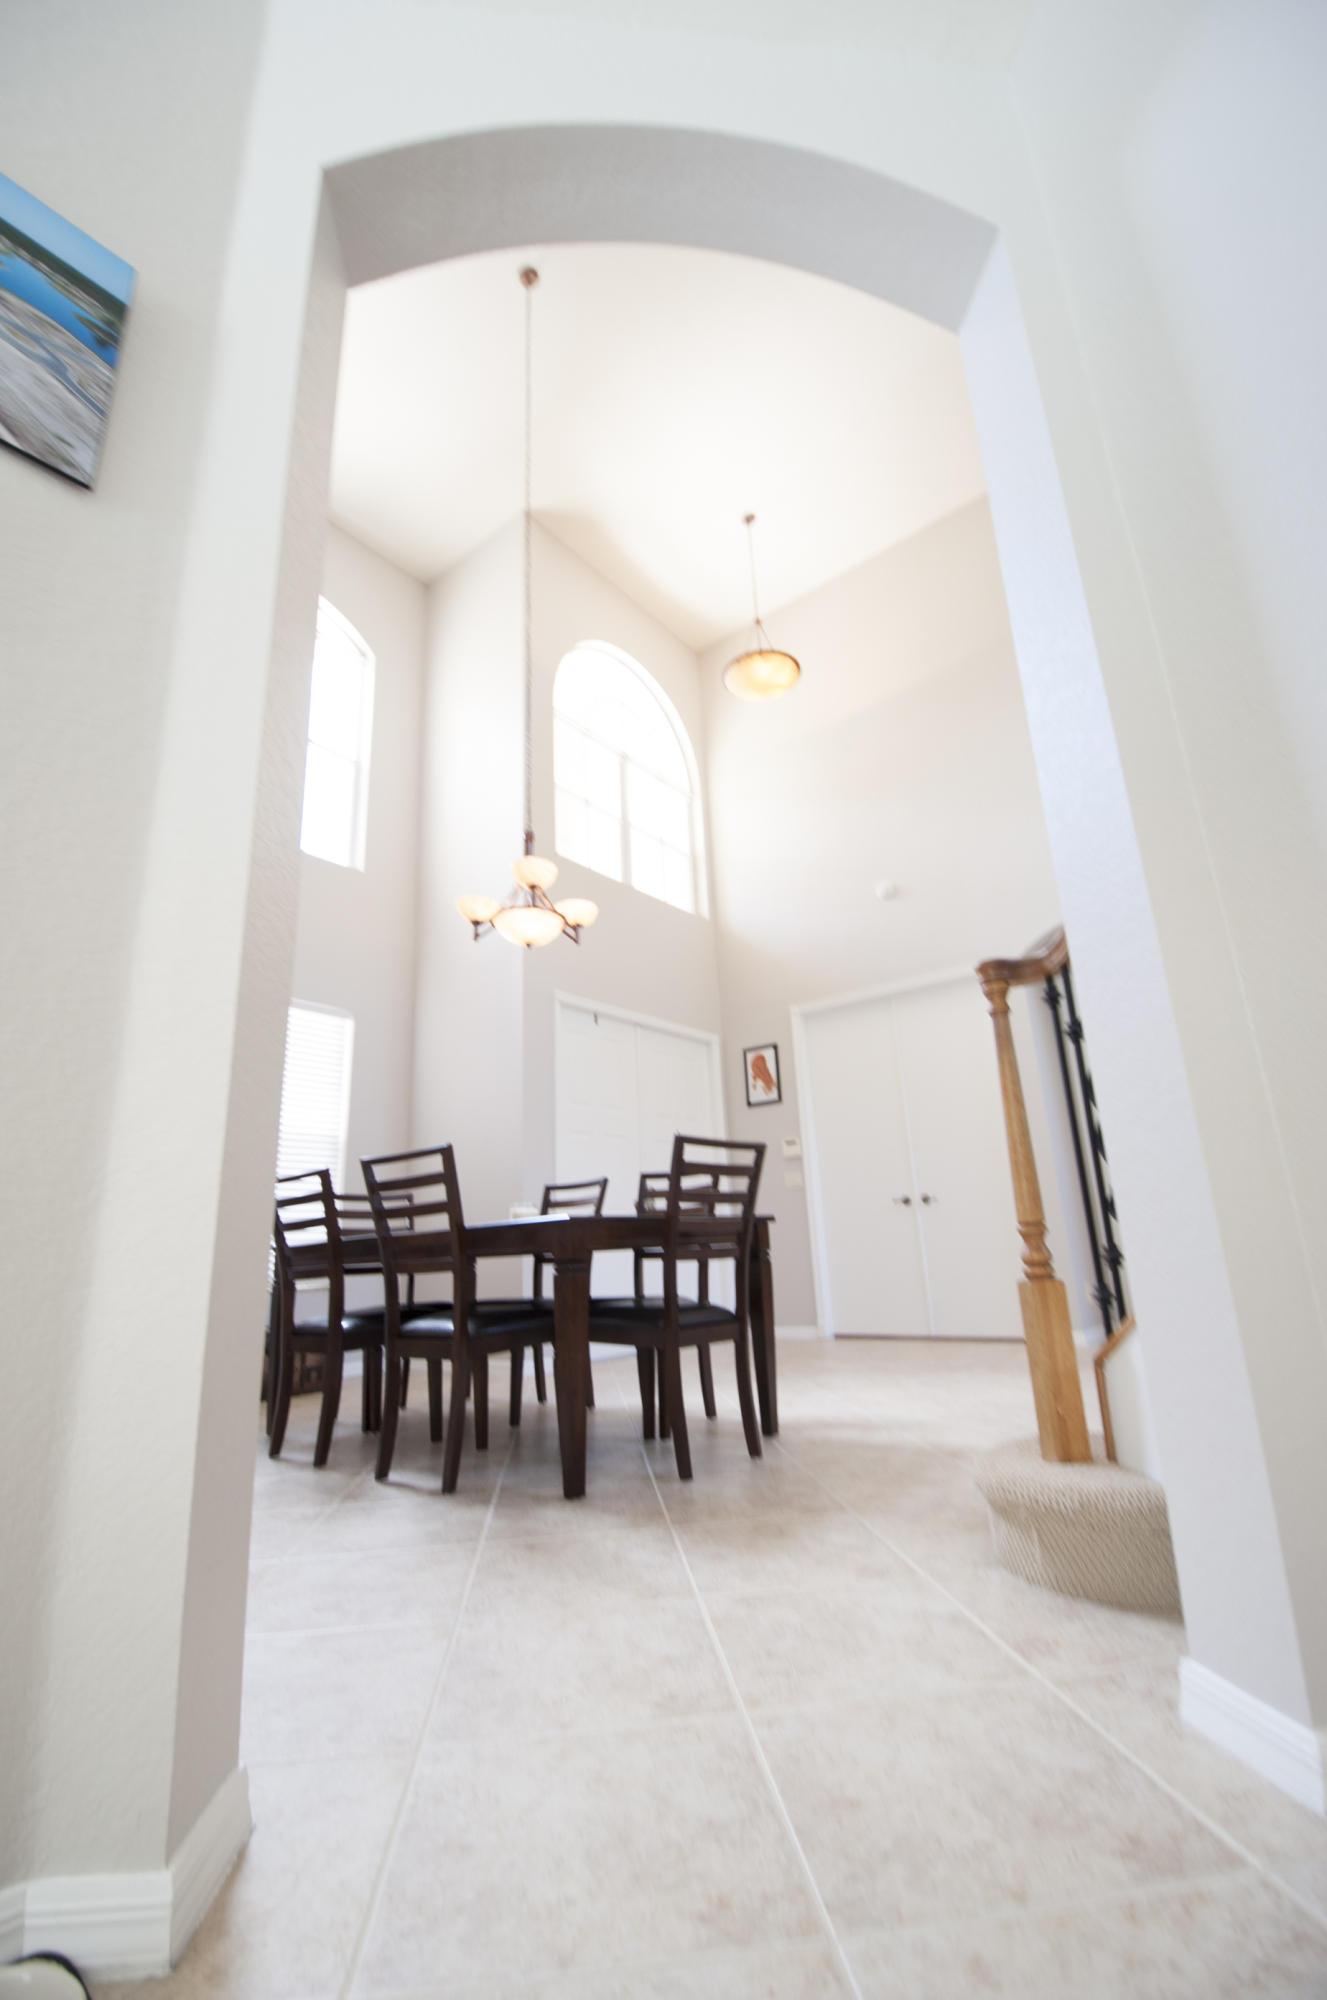 131 Sedona Way, Palm Beach Gardens, Florida 33418, 5 Bedrooms Bedrooms, ,3.1 BathroomsBathrooms,Single Family,For Sale,Sedona,RX-10432570